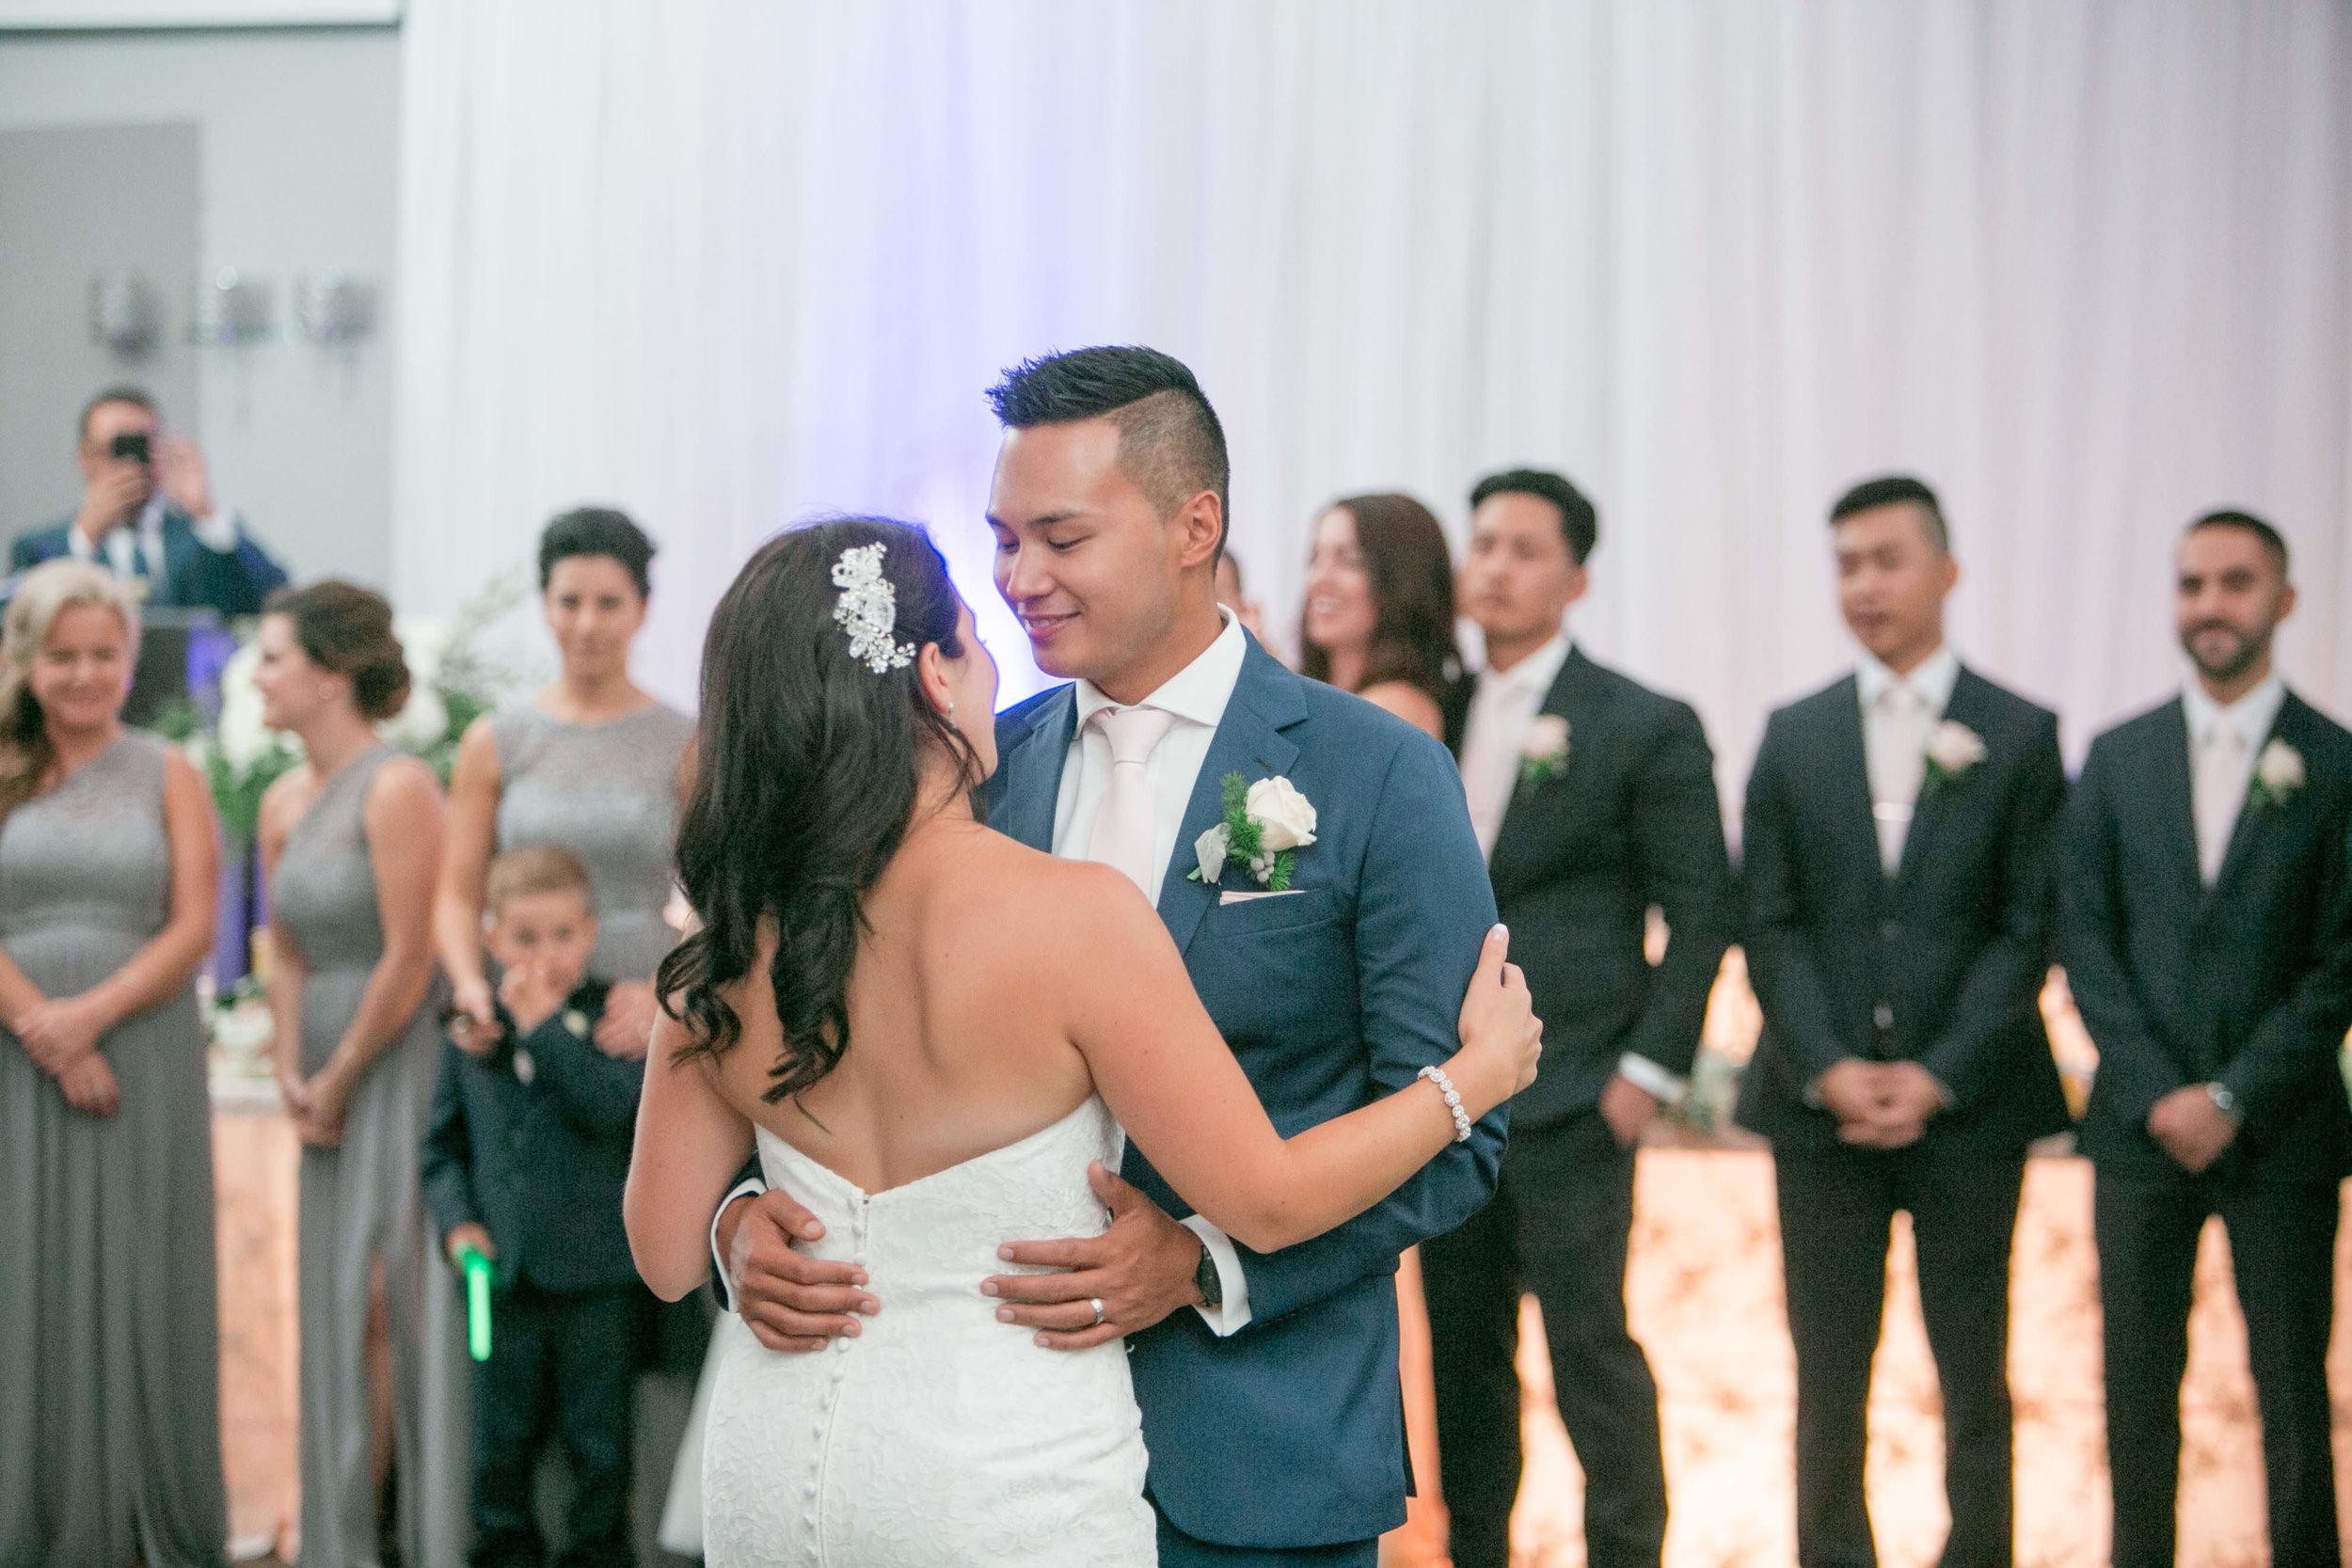 Stefanie___Bernard___Daniel_Ricci_Weddings_High_Res._Finals__536.jpg